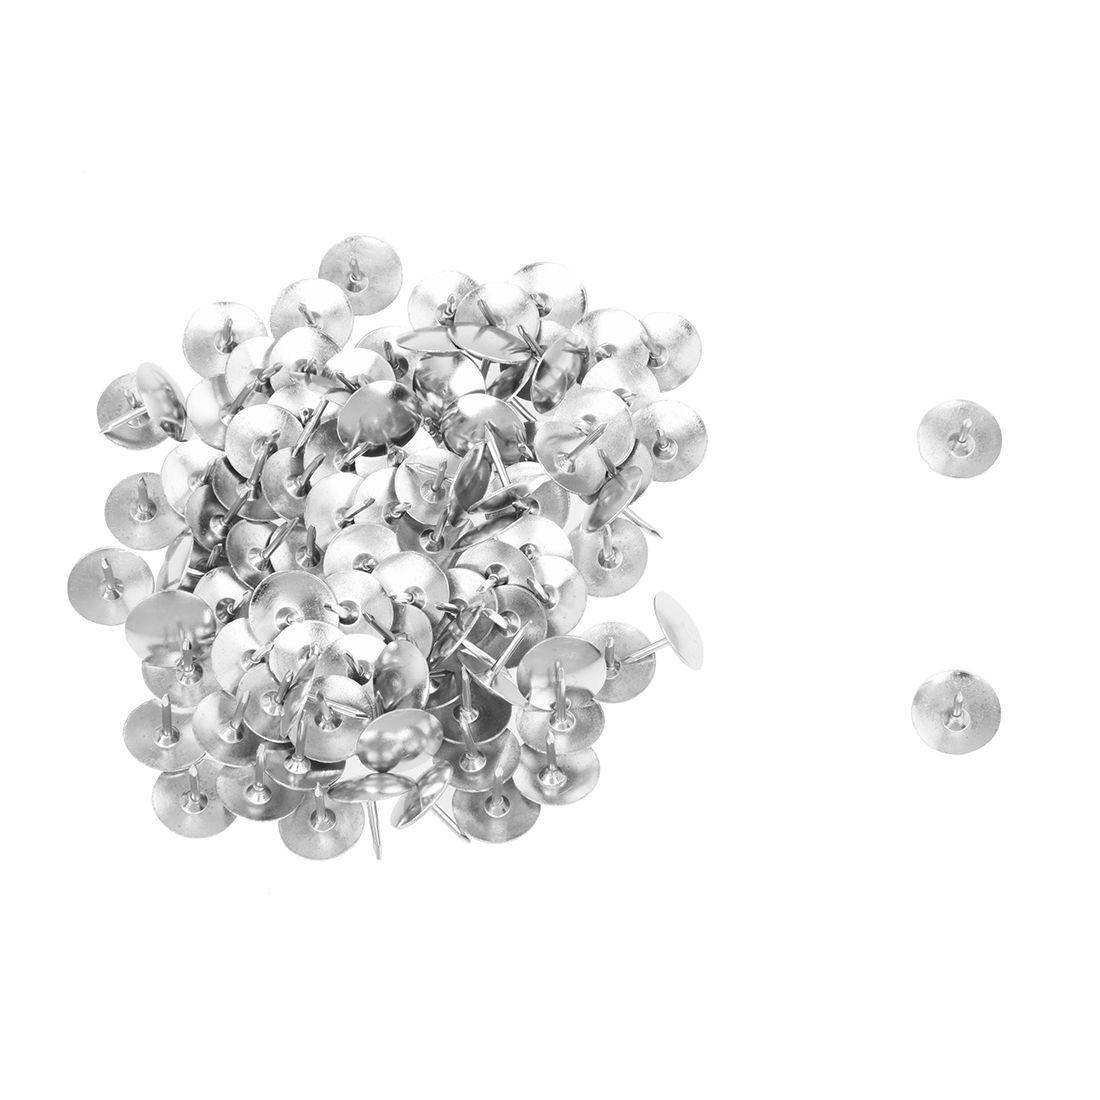 100pcs silver tone corkboard photo push pins thumb tacks office